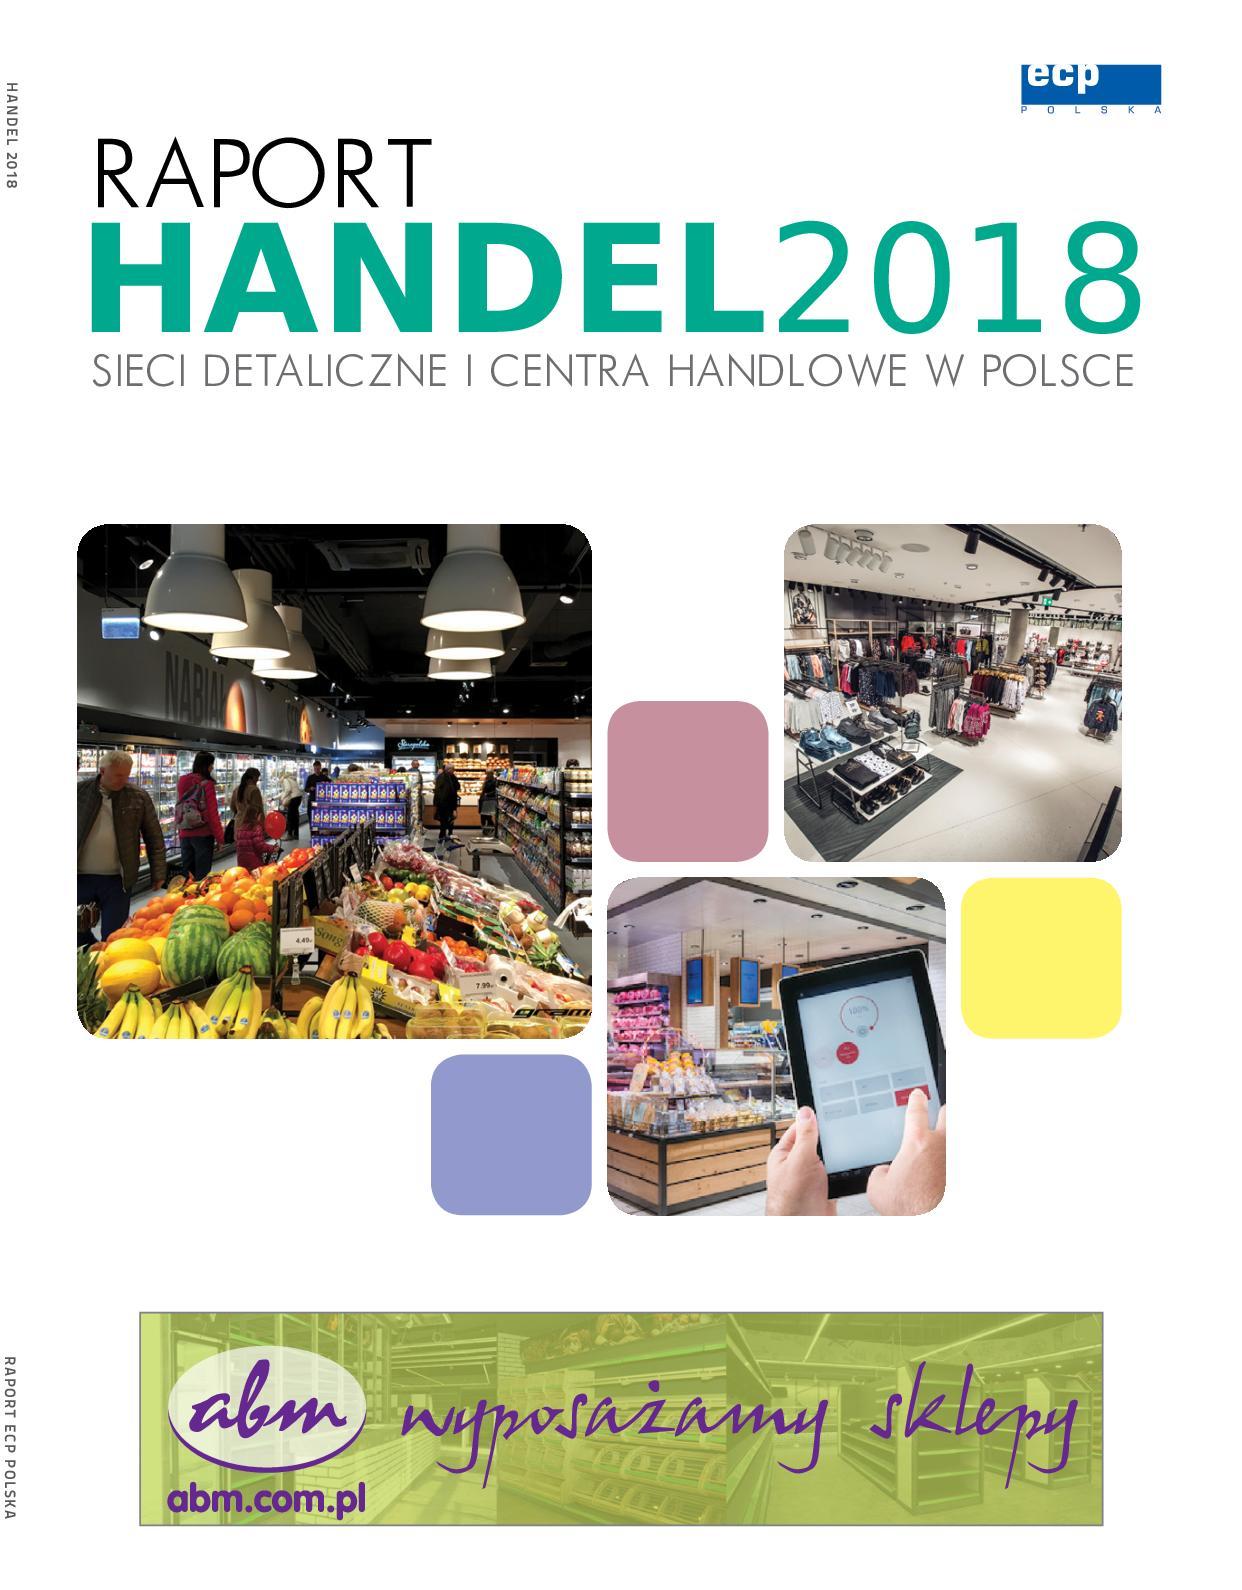 bfcb720be391f9 Calaméo - Handel 2018